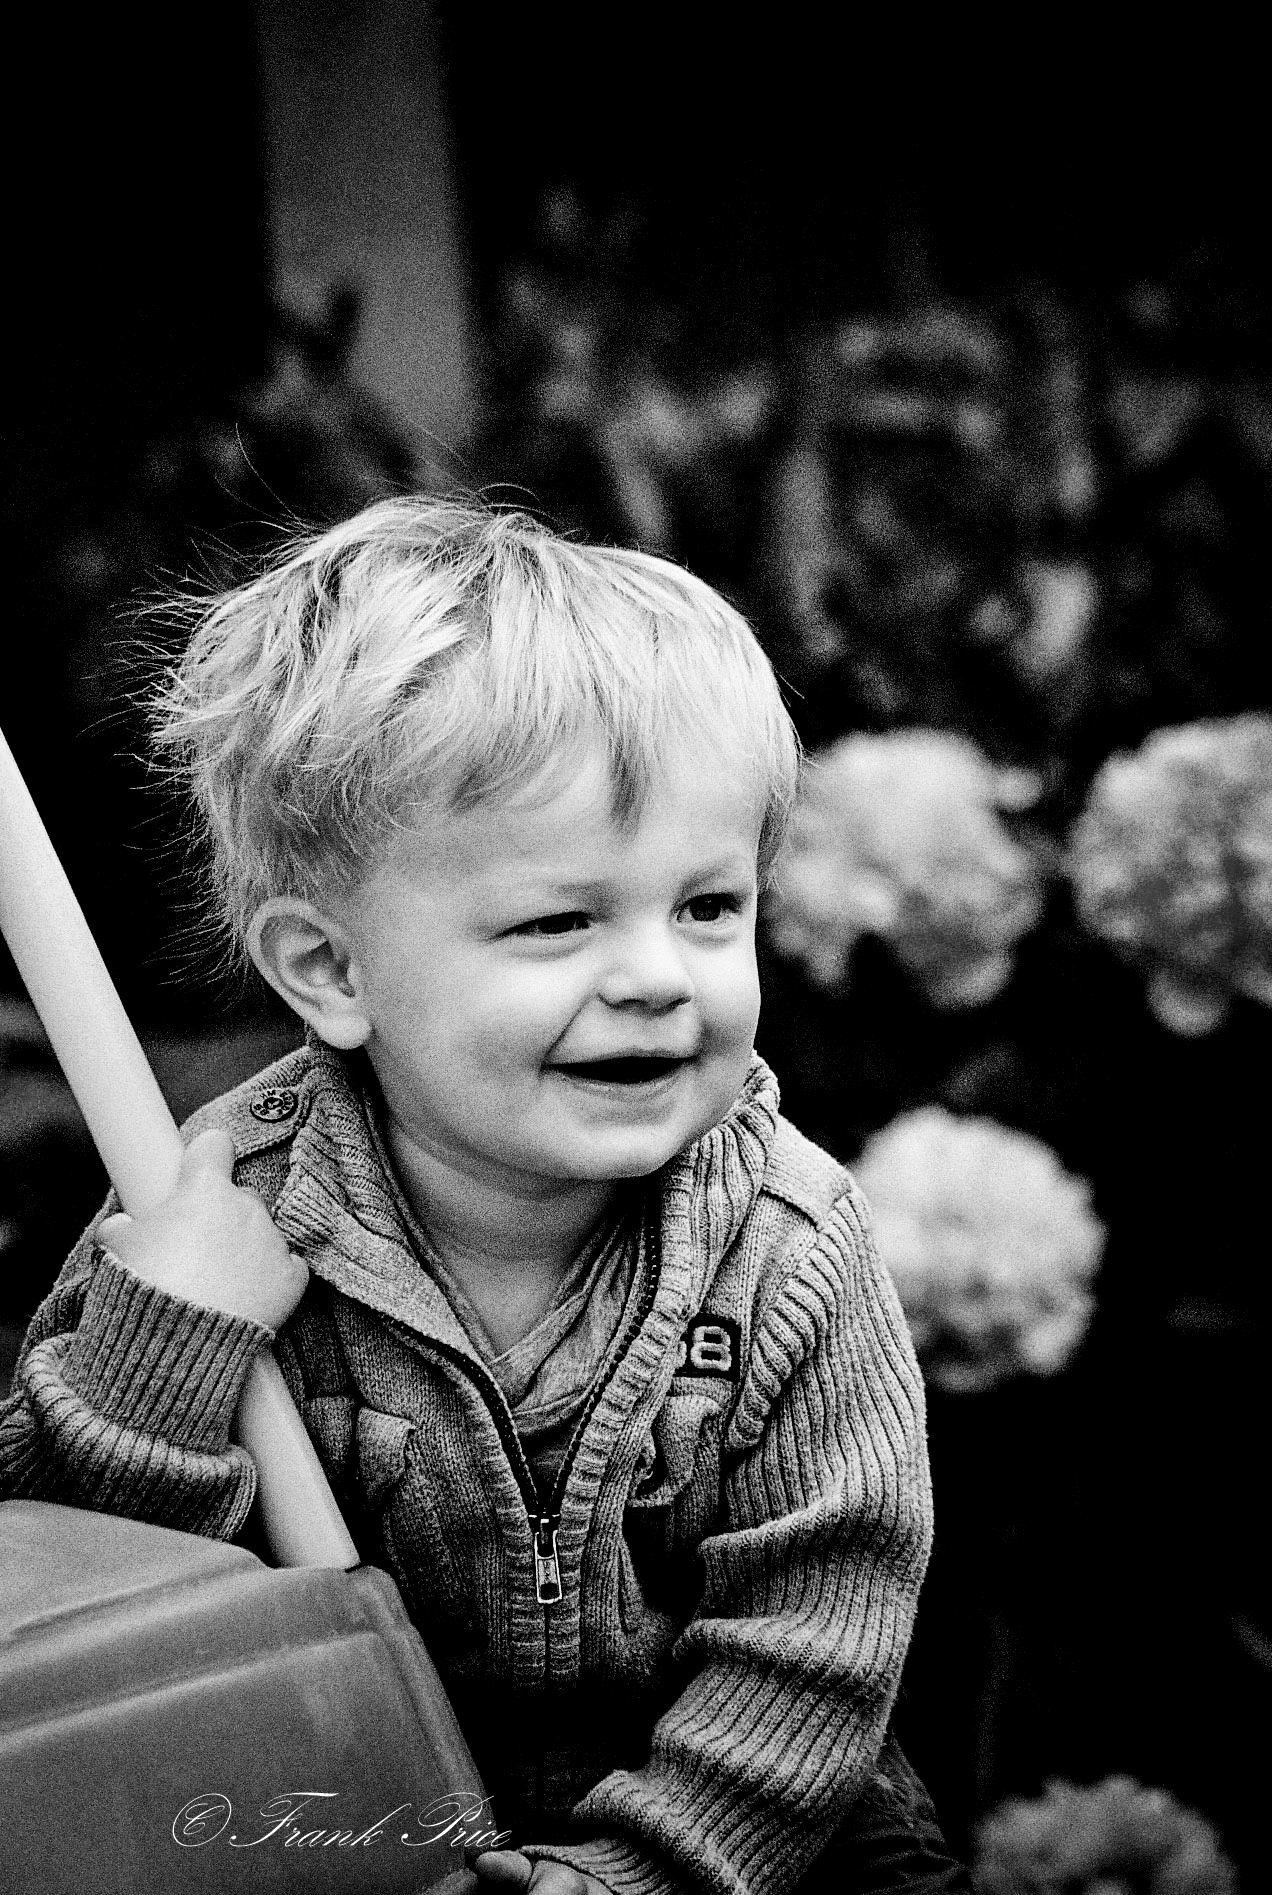 Felice piccolo uomo...